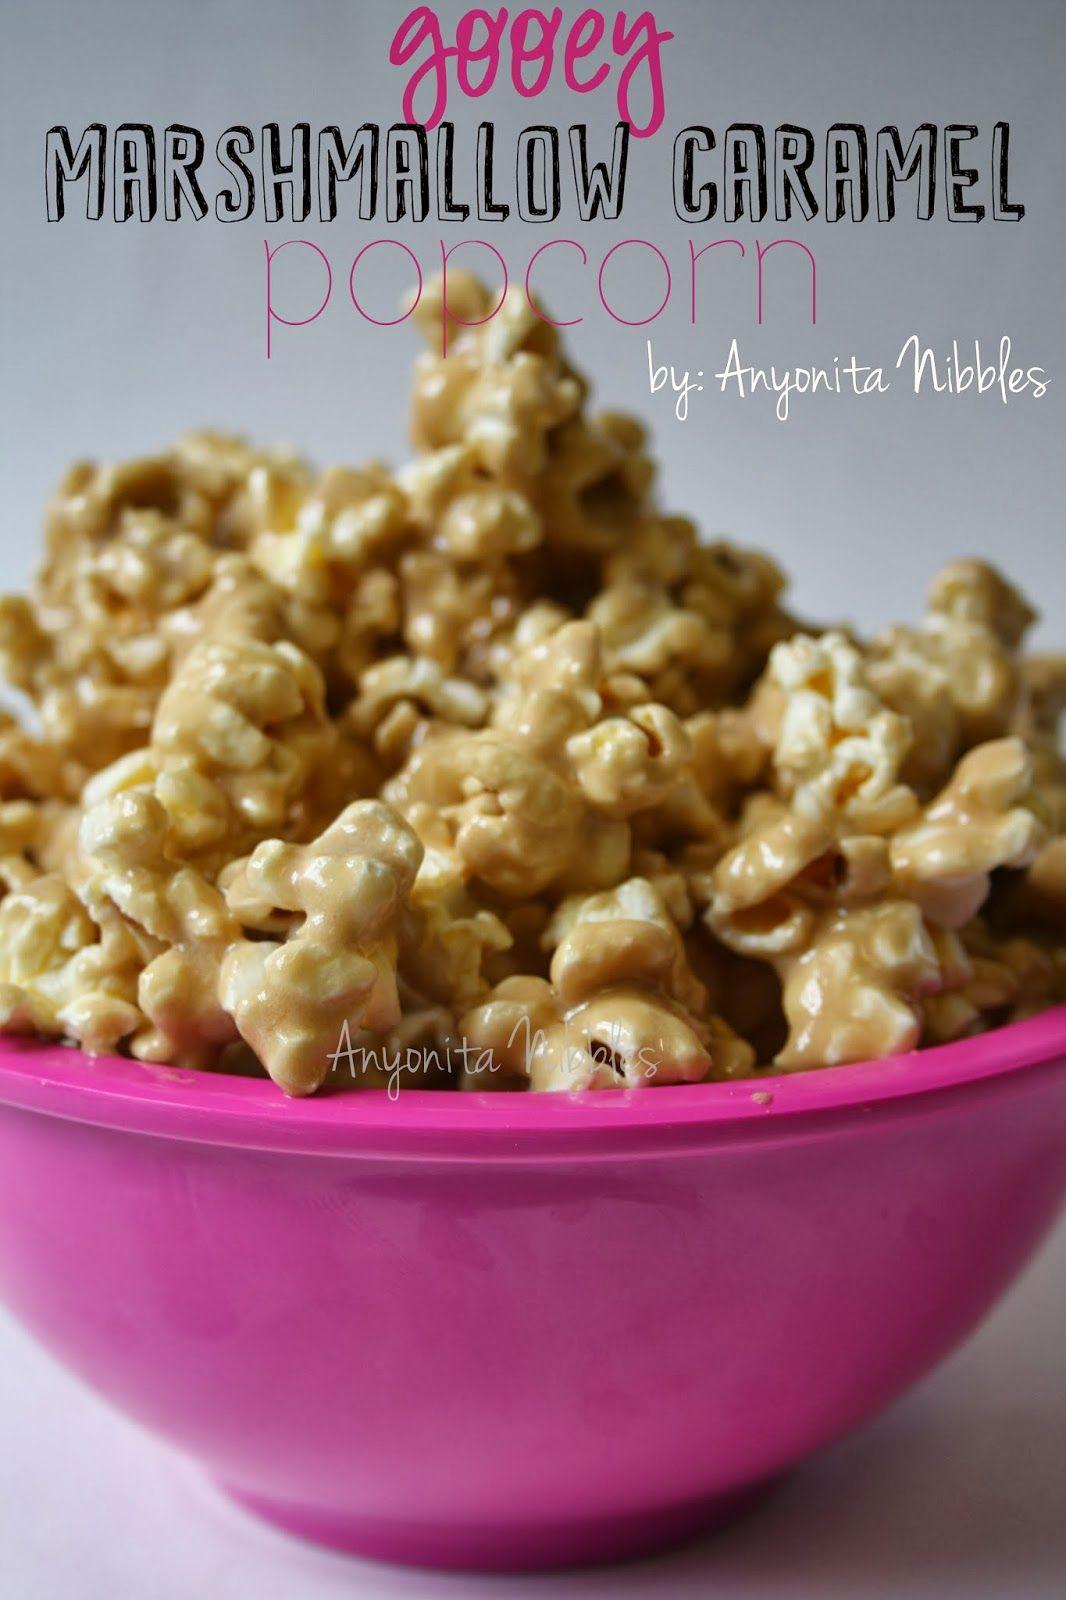 Gooey Marshmallow Caramel Popcorn from Anyonita Nibbles